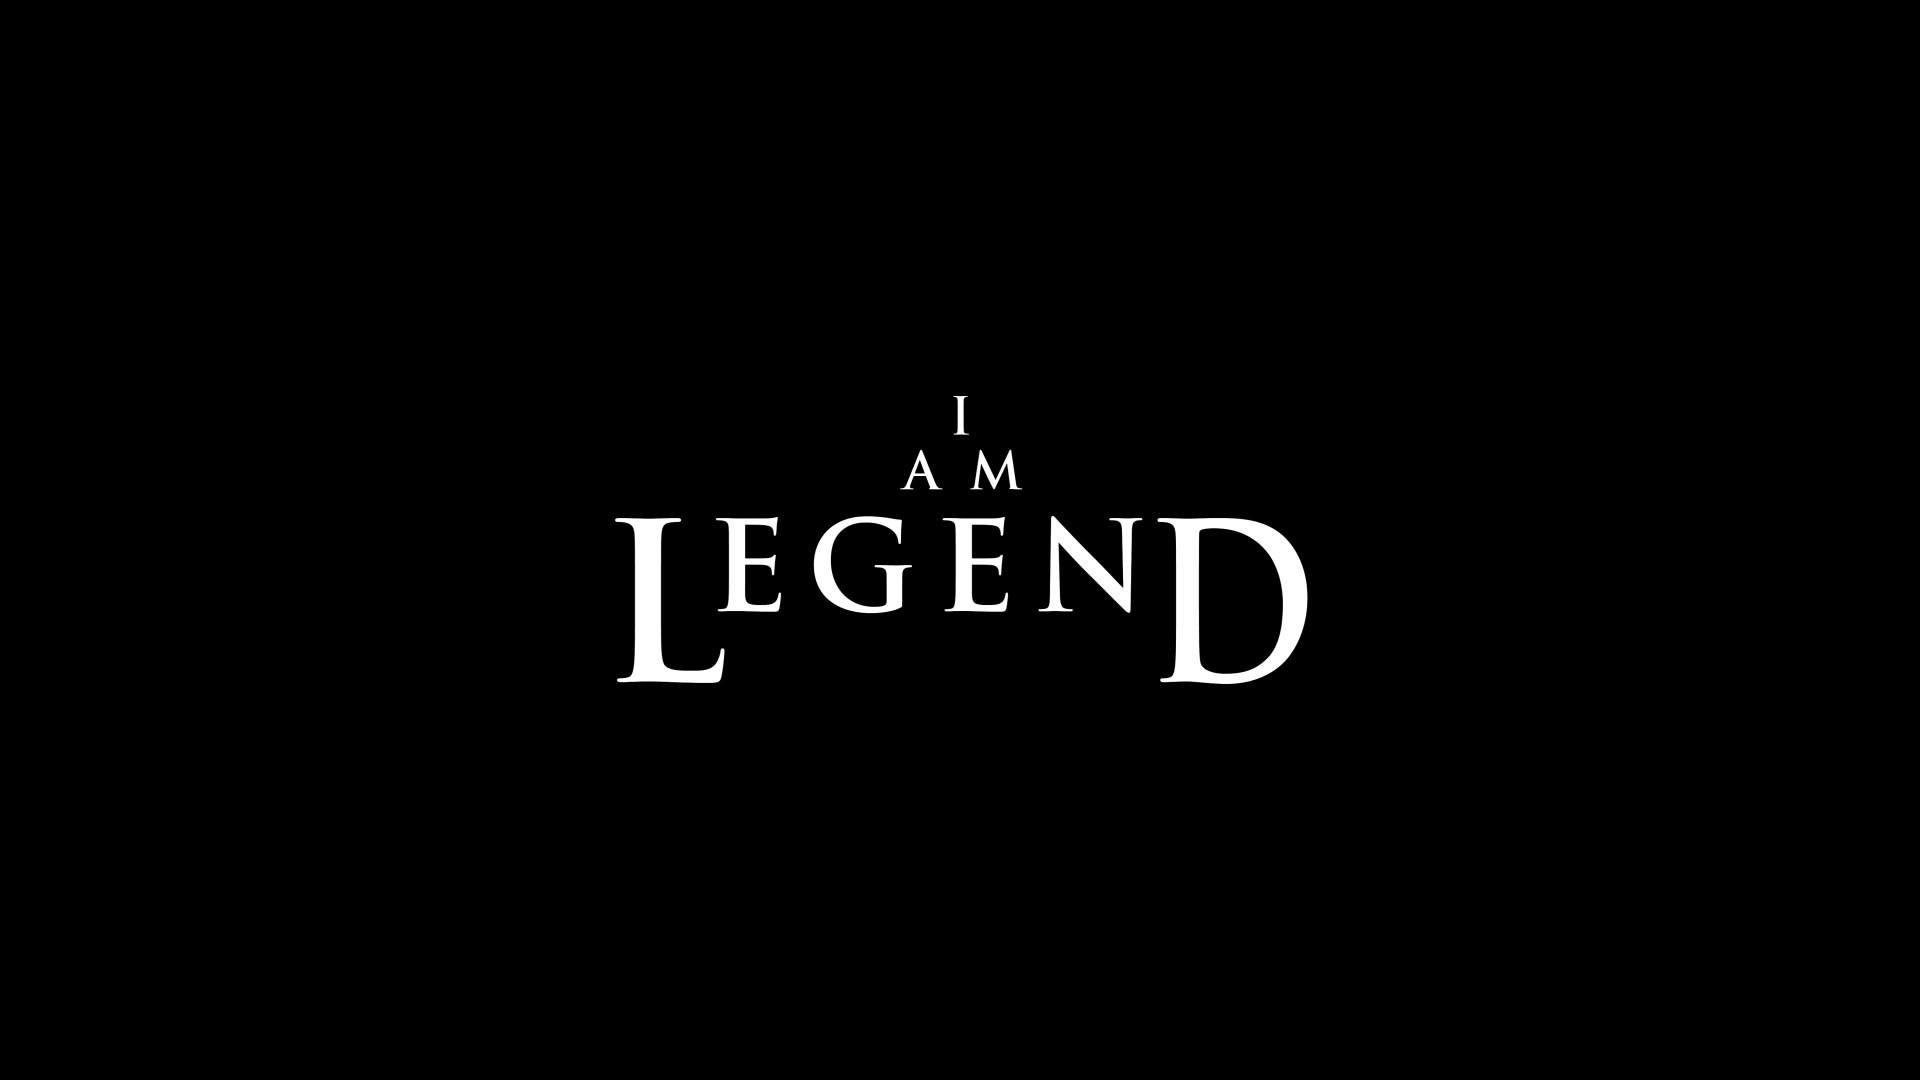 i am legend wallpapers 67 images